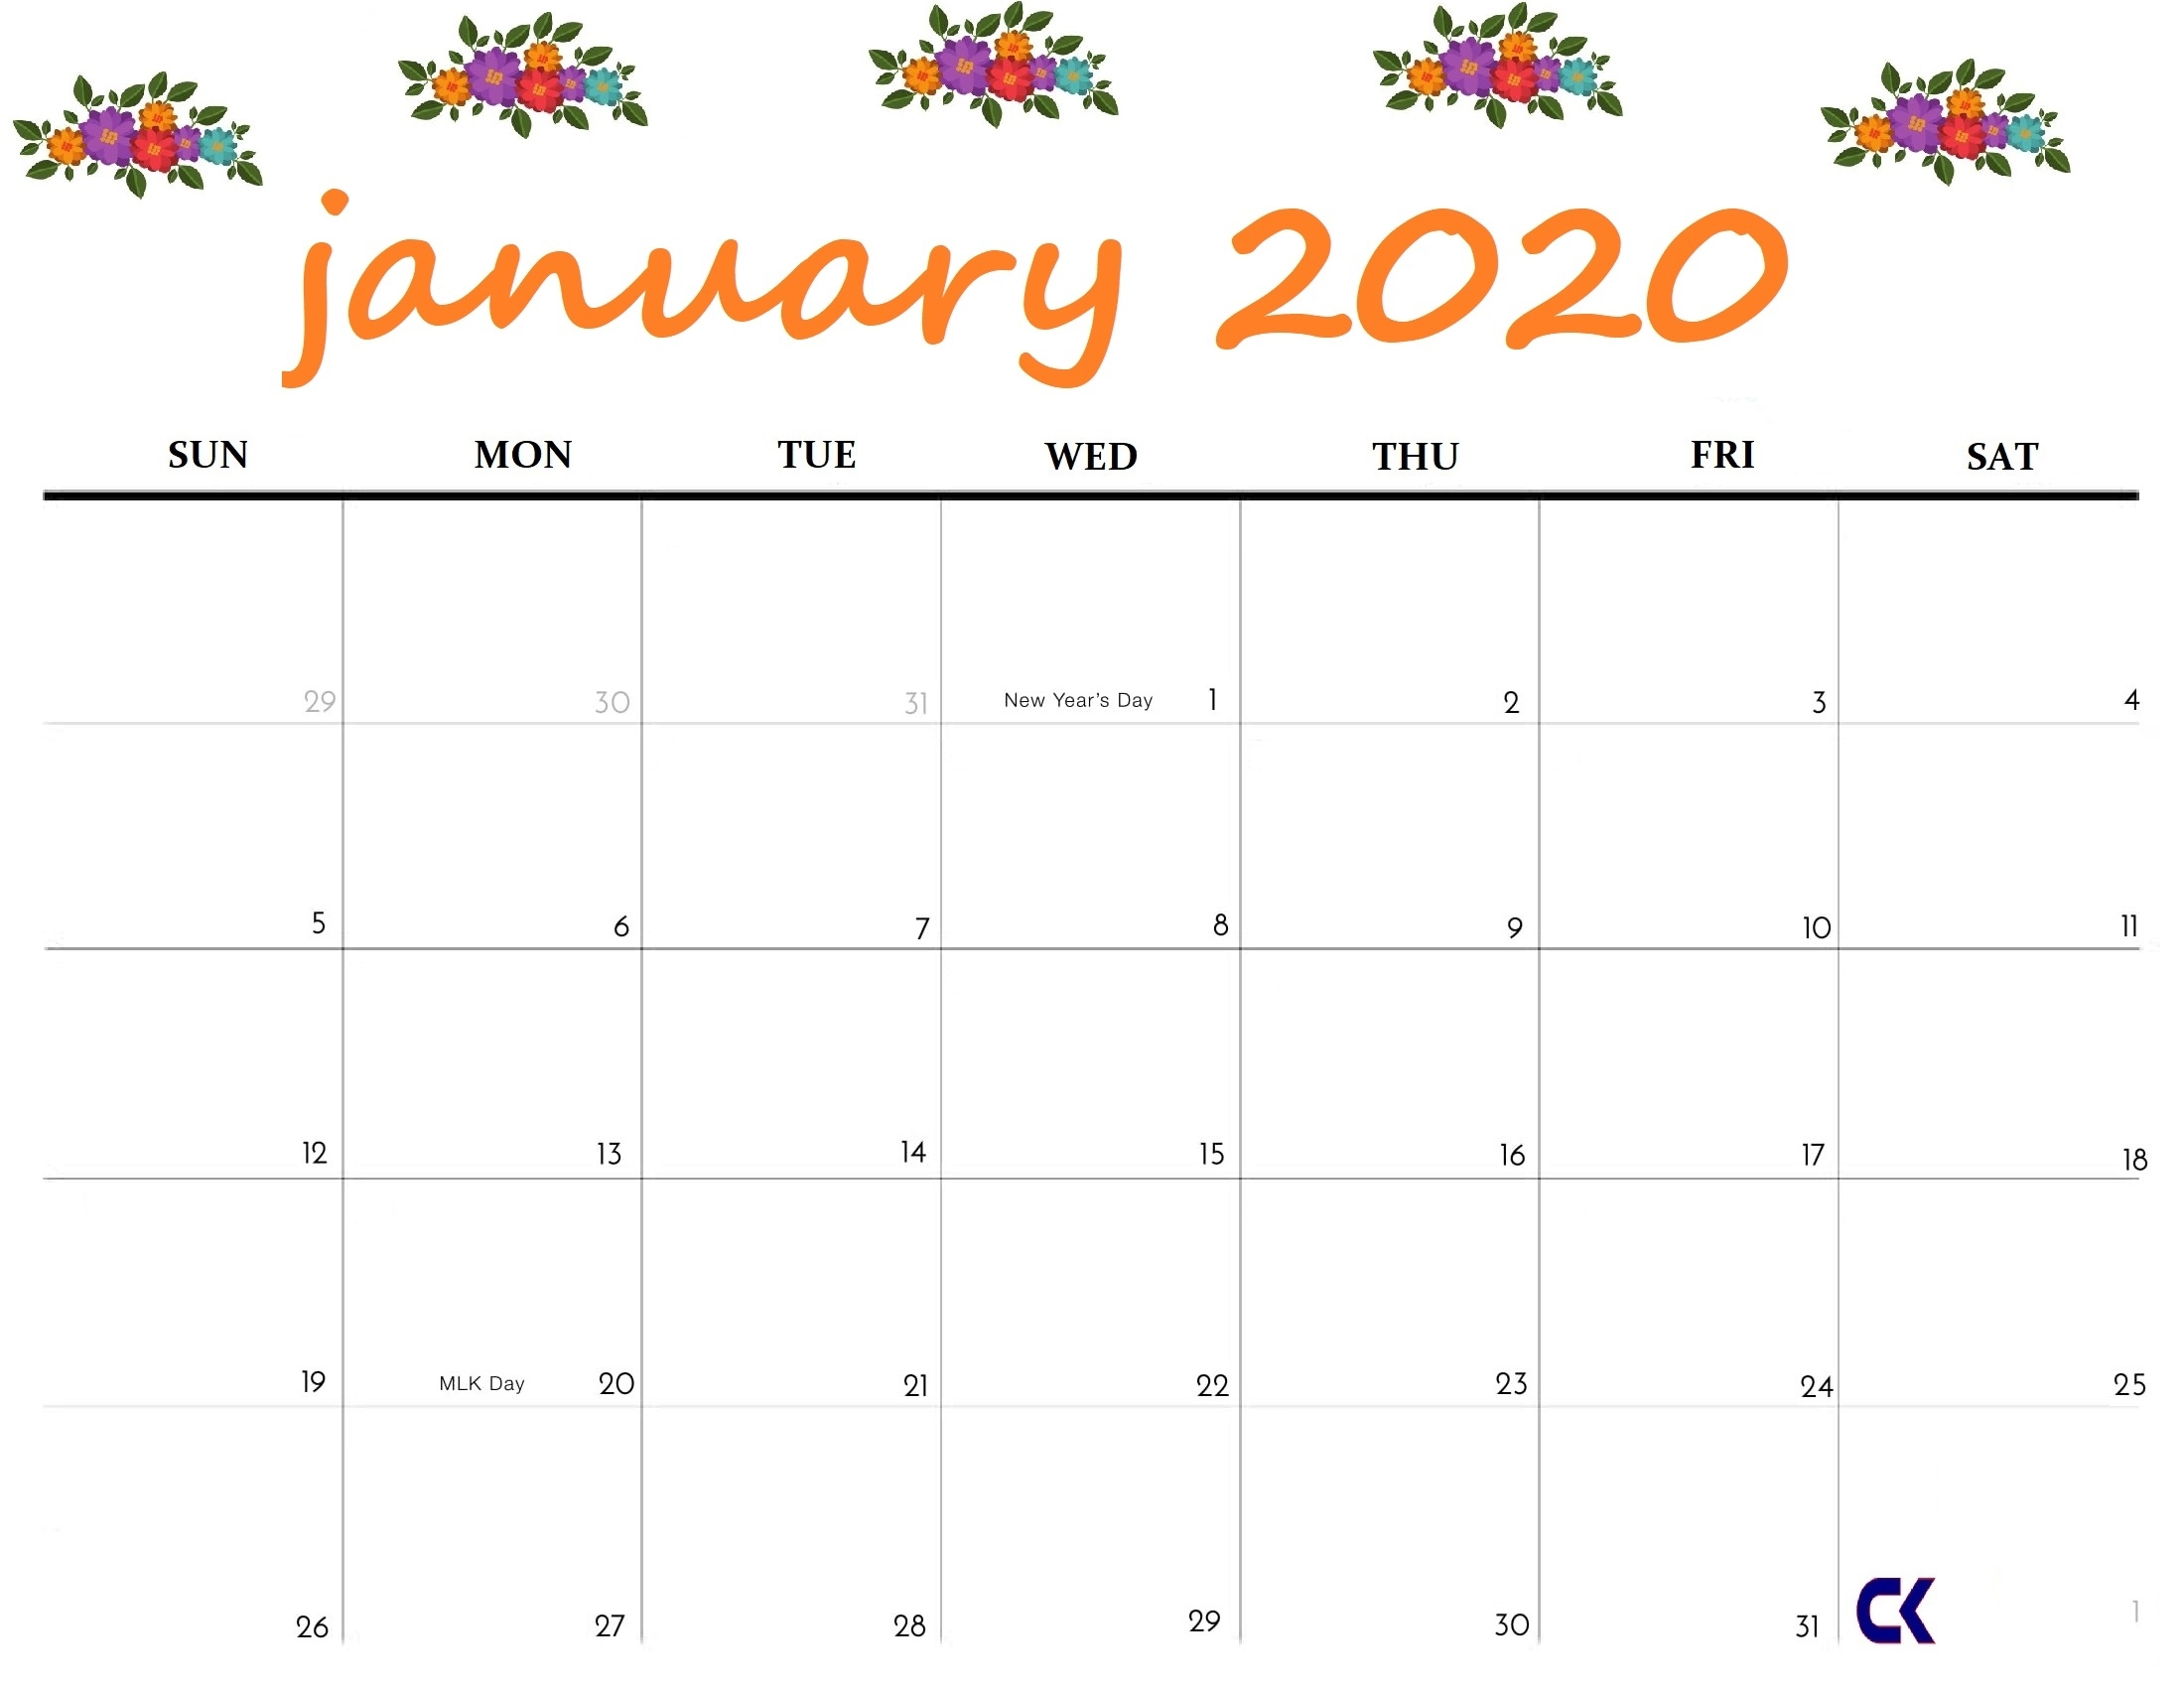 Printable January 2020 Calendar - Perky Printable Calendar 2020 Of Ridiculous Holidays